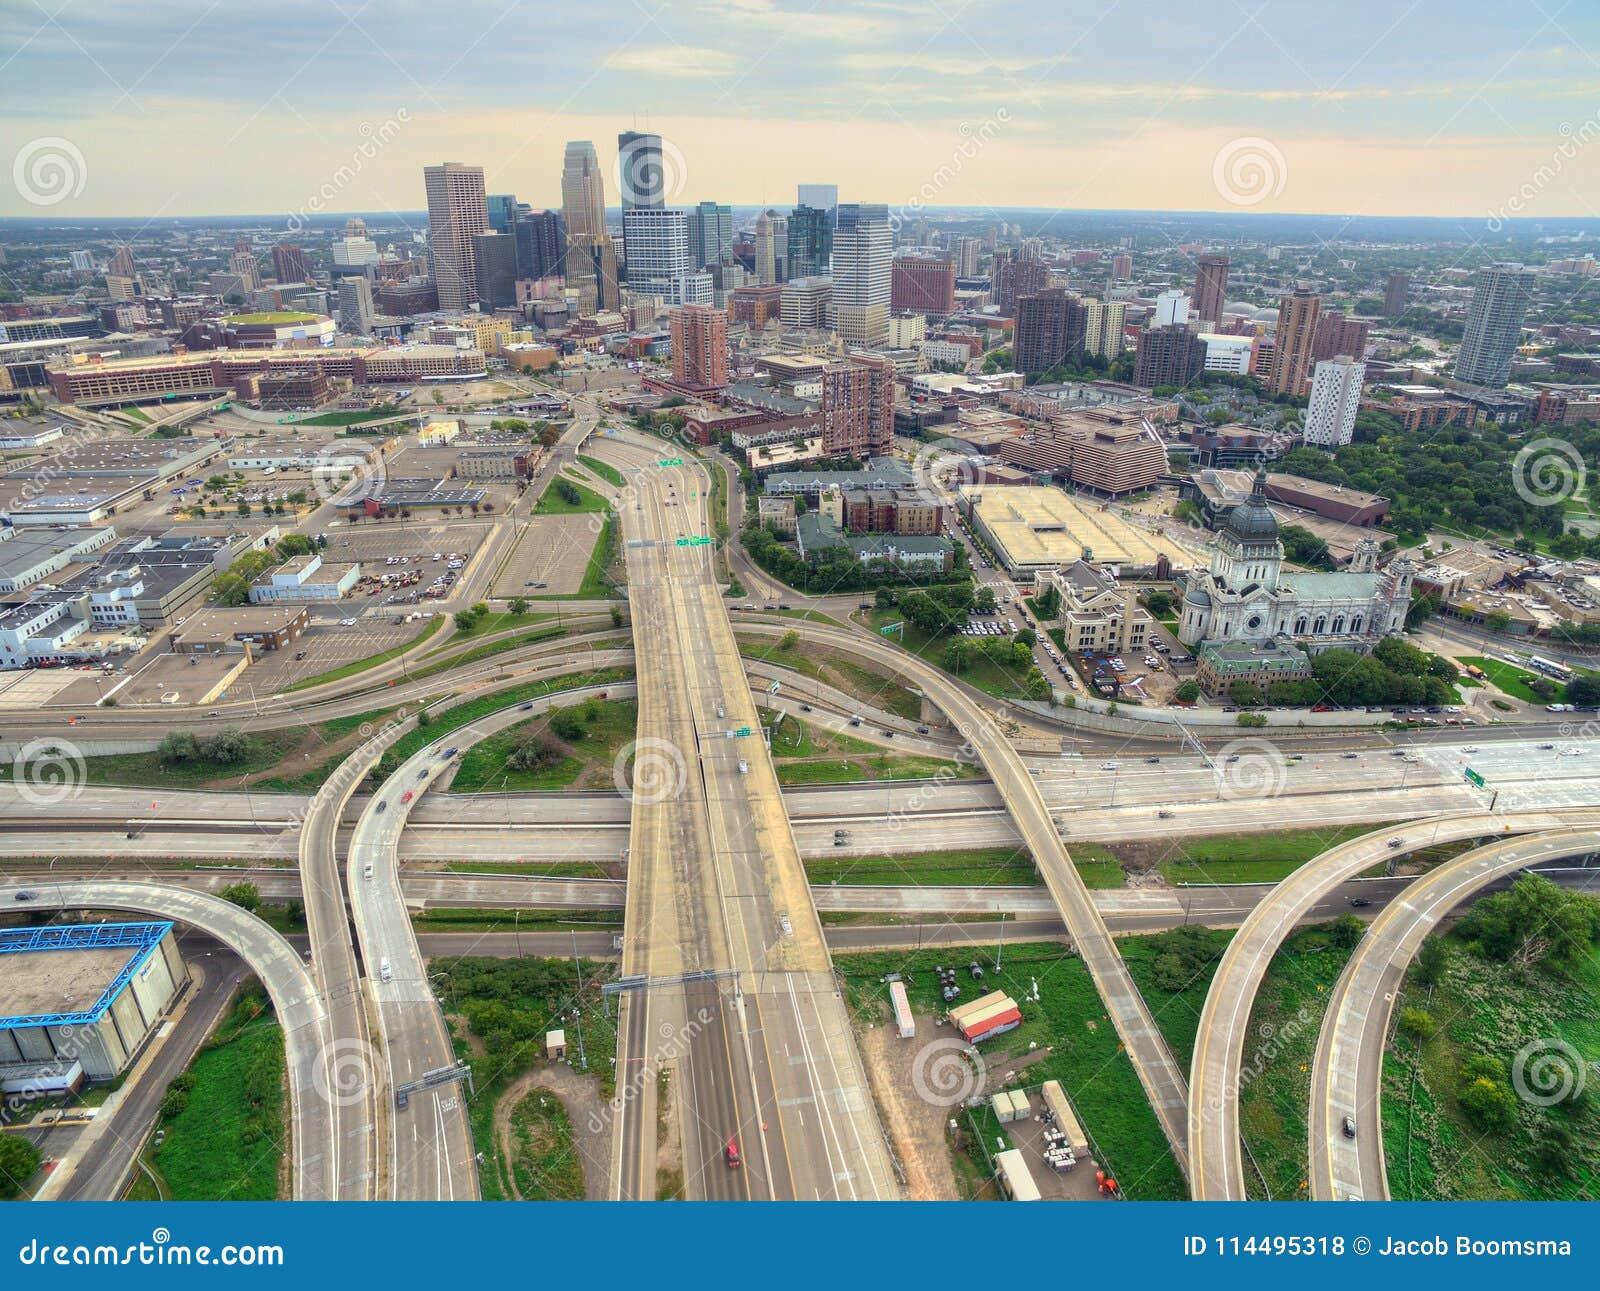 Minneapolis Skyline in Minnesota, USA